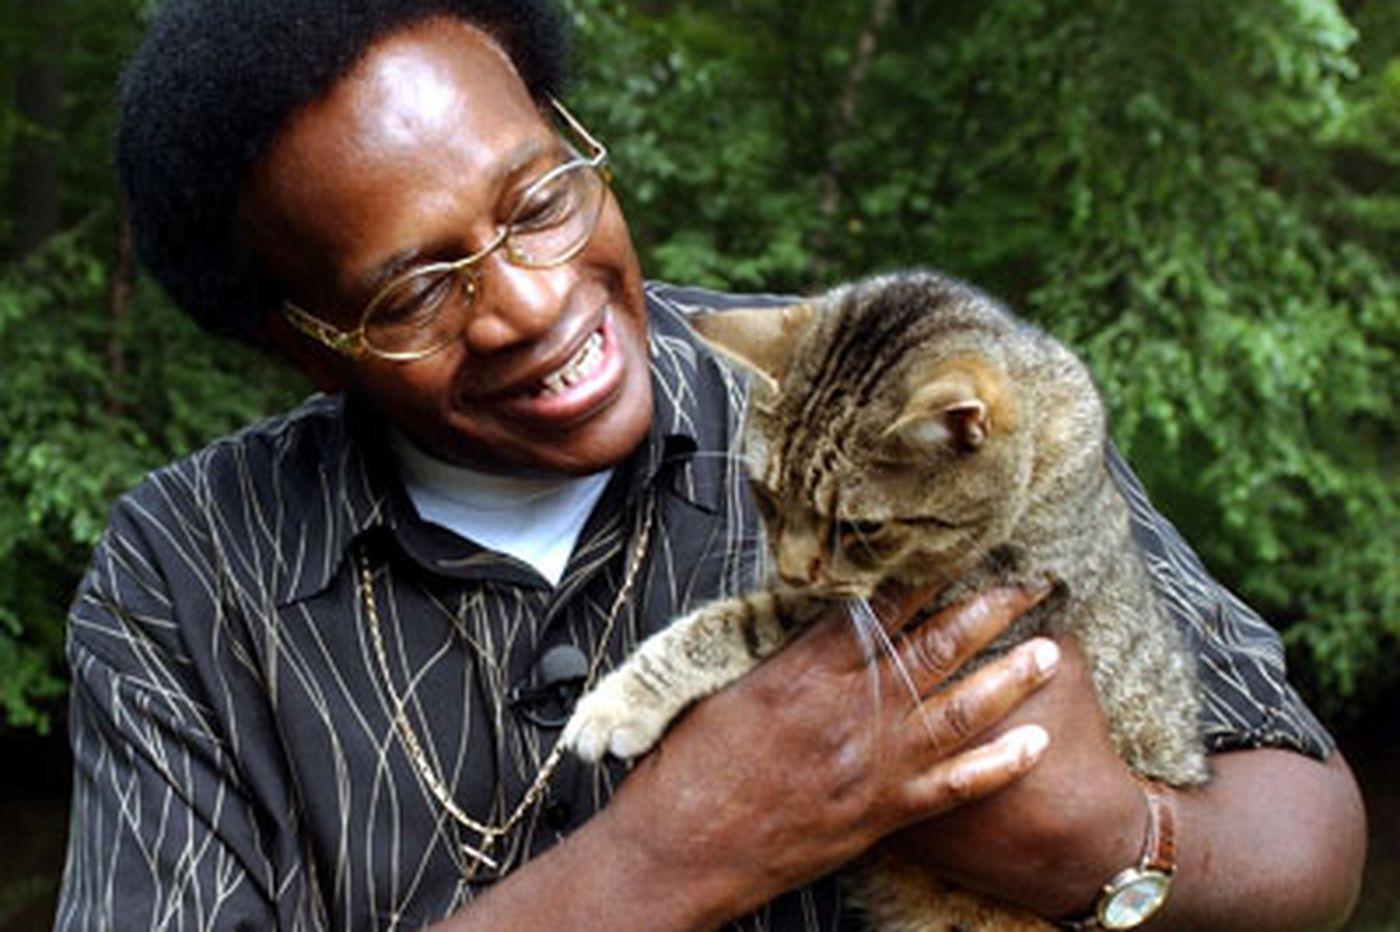 Howard Tate, 72, talented soul singer